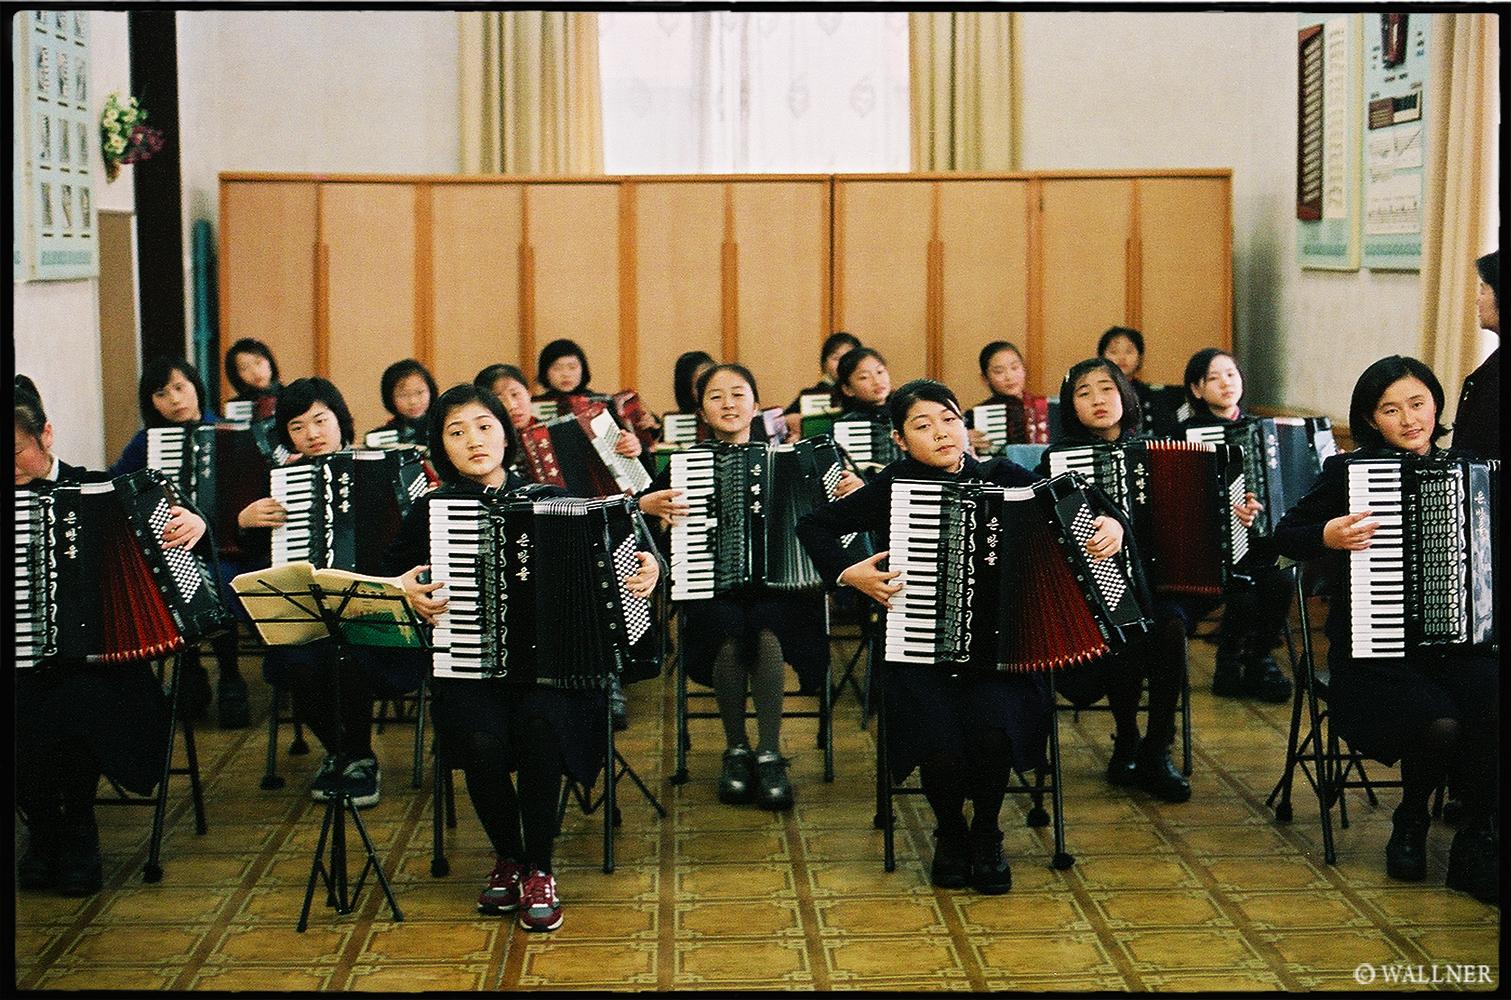 35mmPatrikWallner_Pyongyang_SchoolVisitLOWQ